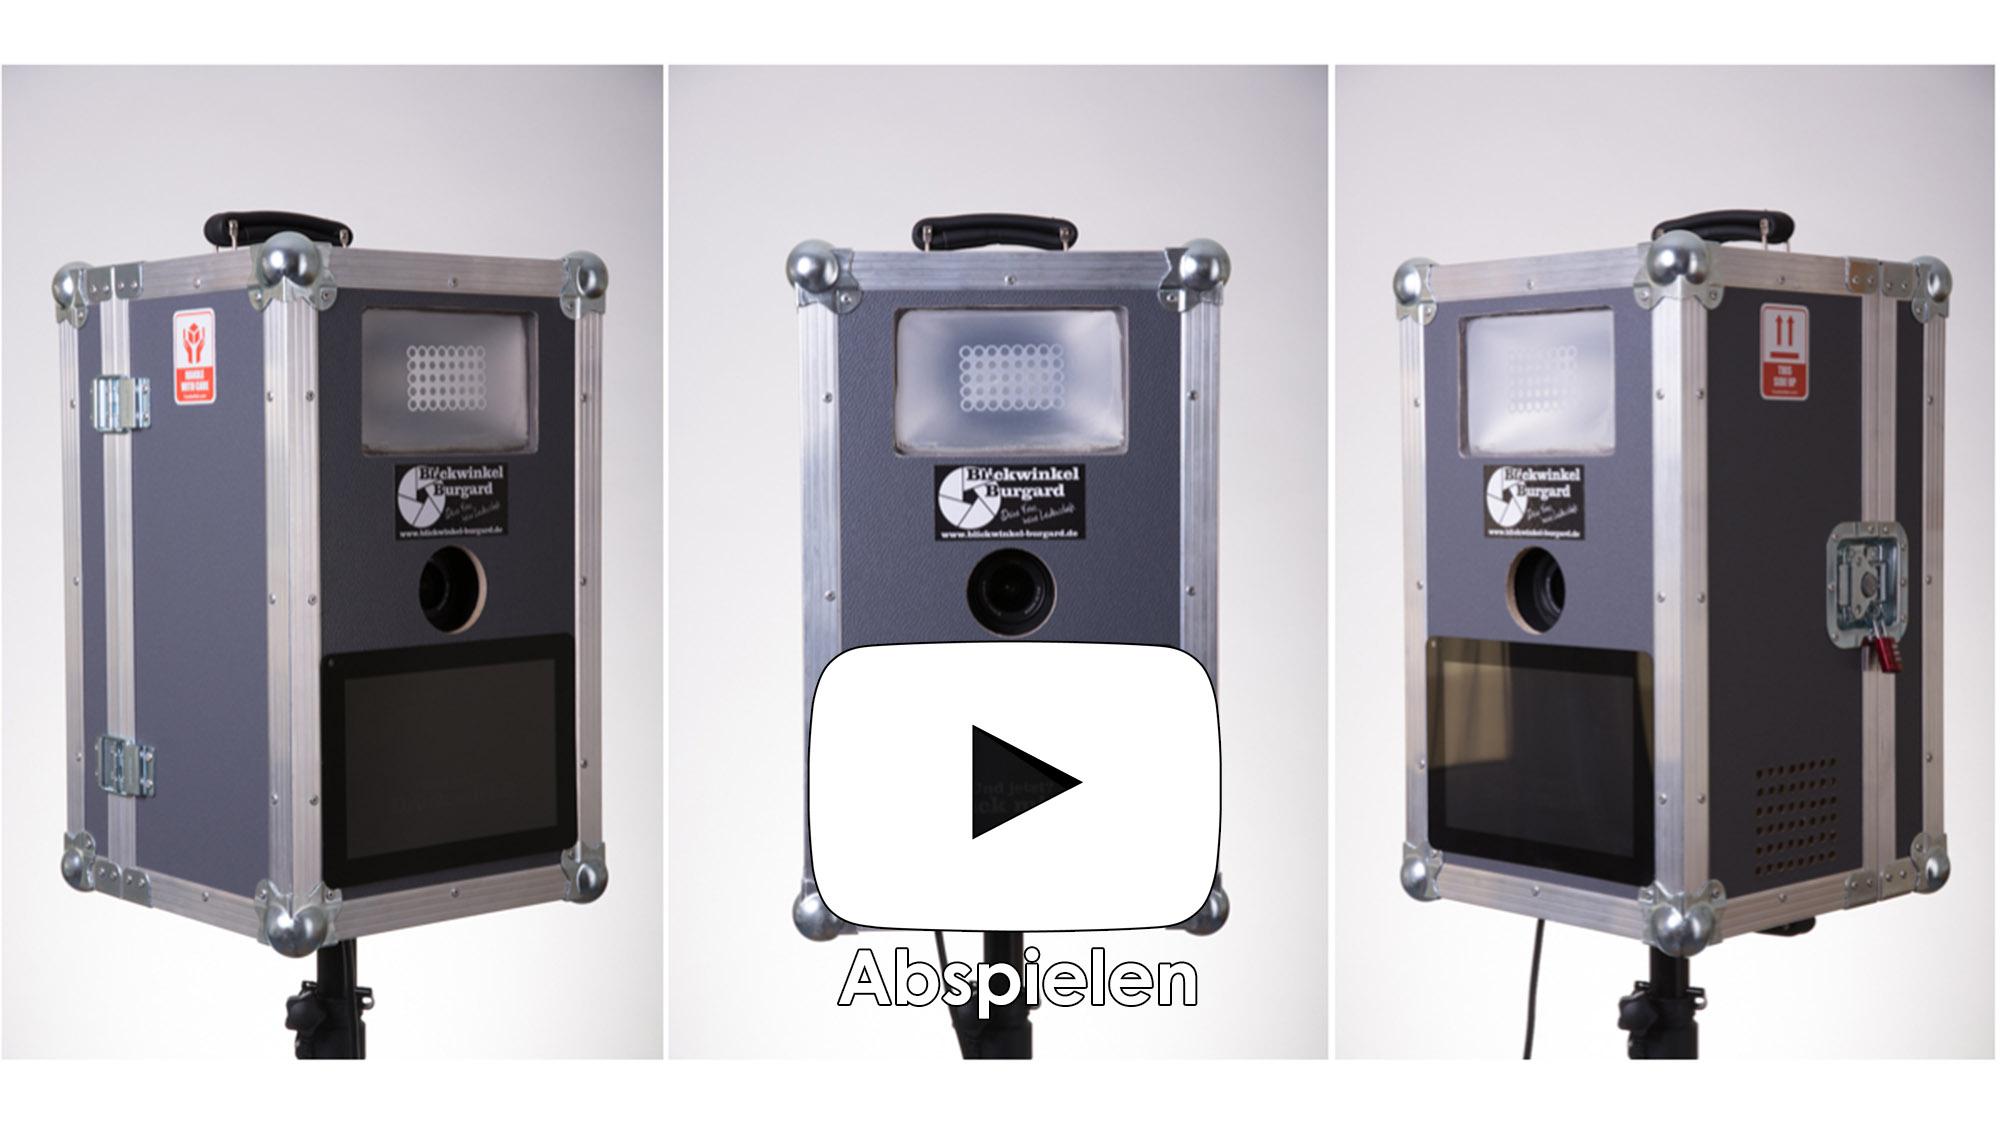 blickbox photobooth fotobox blickwinkel burgard. Black Bedroom Furniture Sets. Home Design Ideas